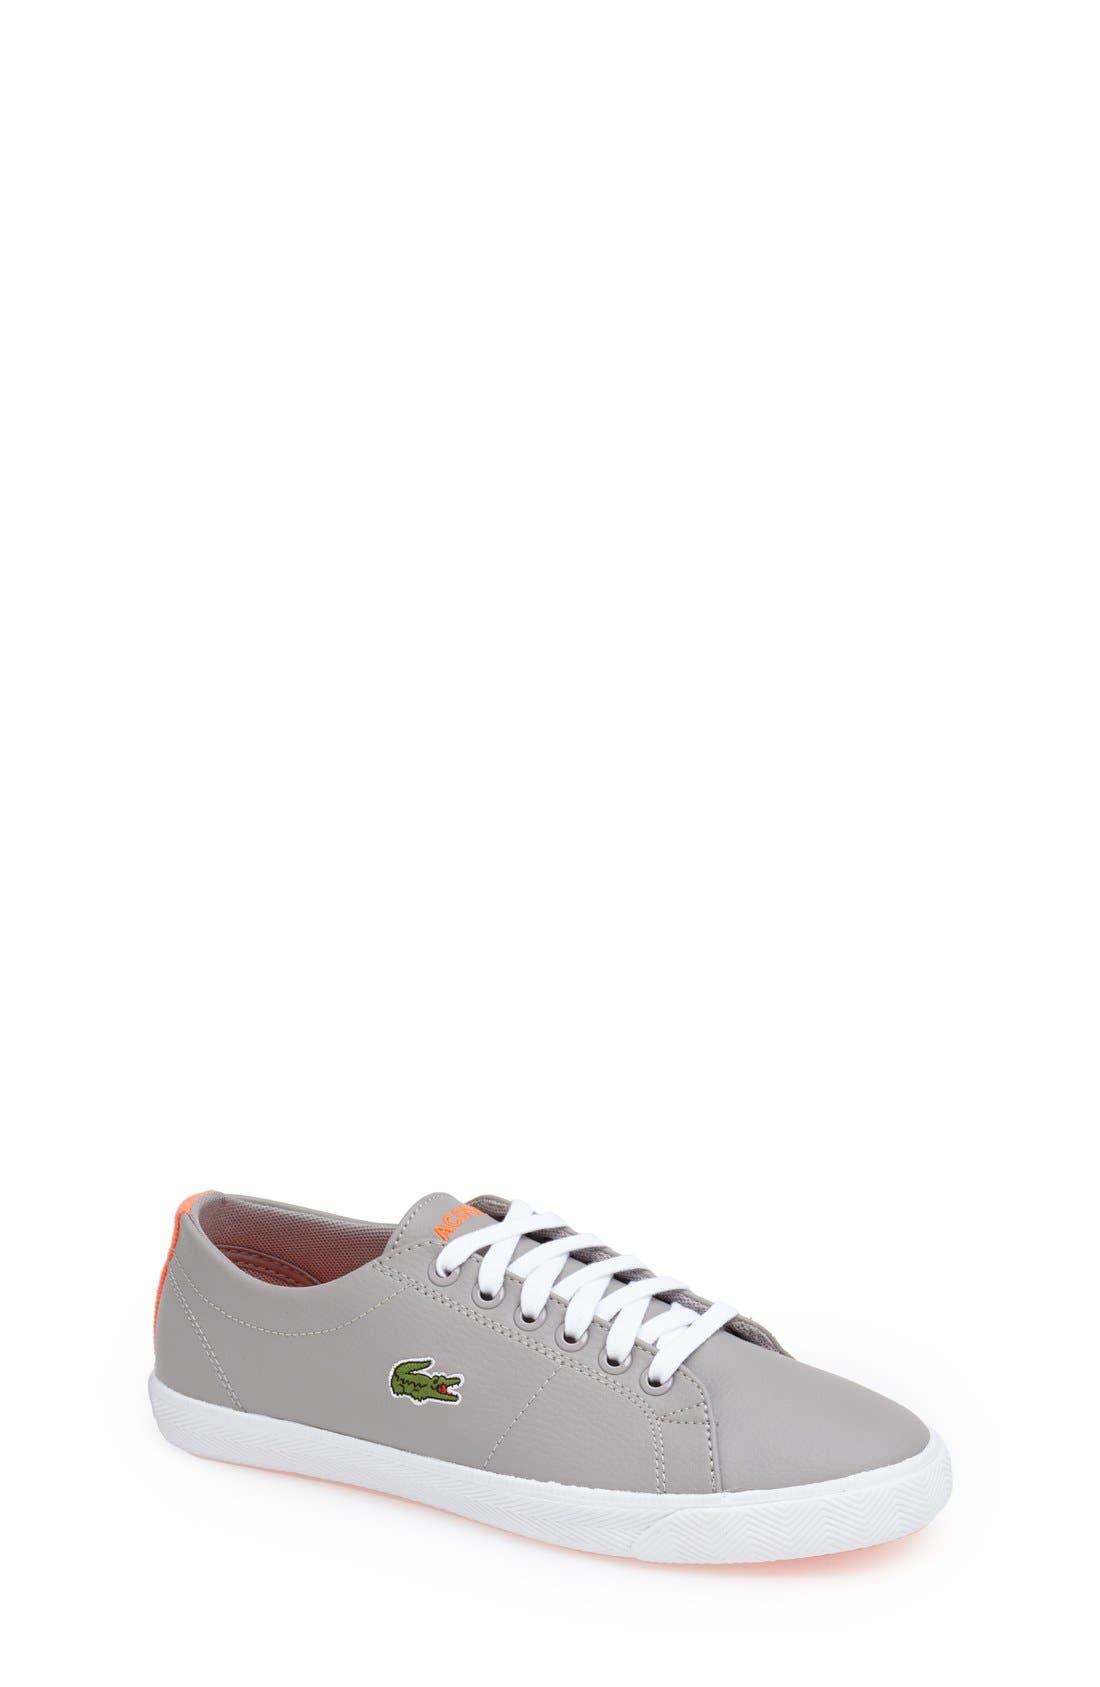 Alternate Image 1 Selected - Lacoste 'Marcel' Sneaker (Toddler, Little Kid & Big Kid)